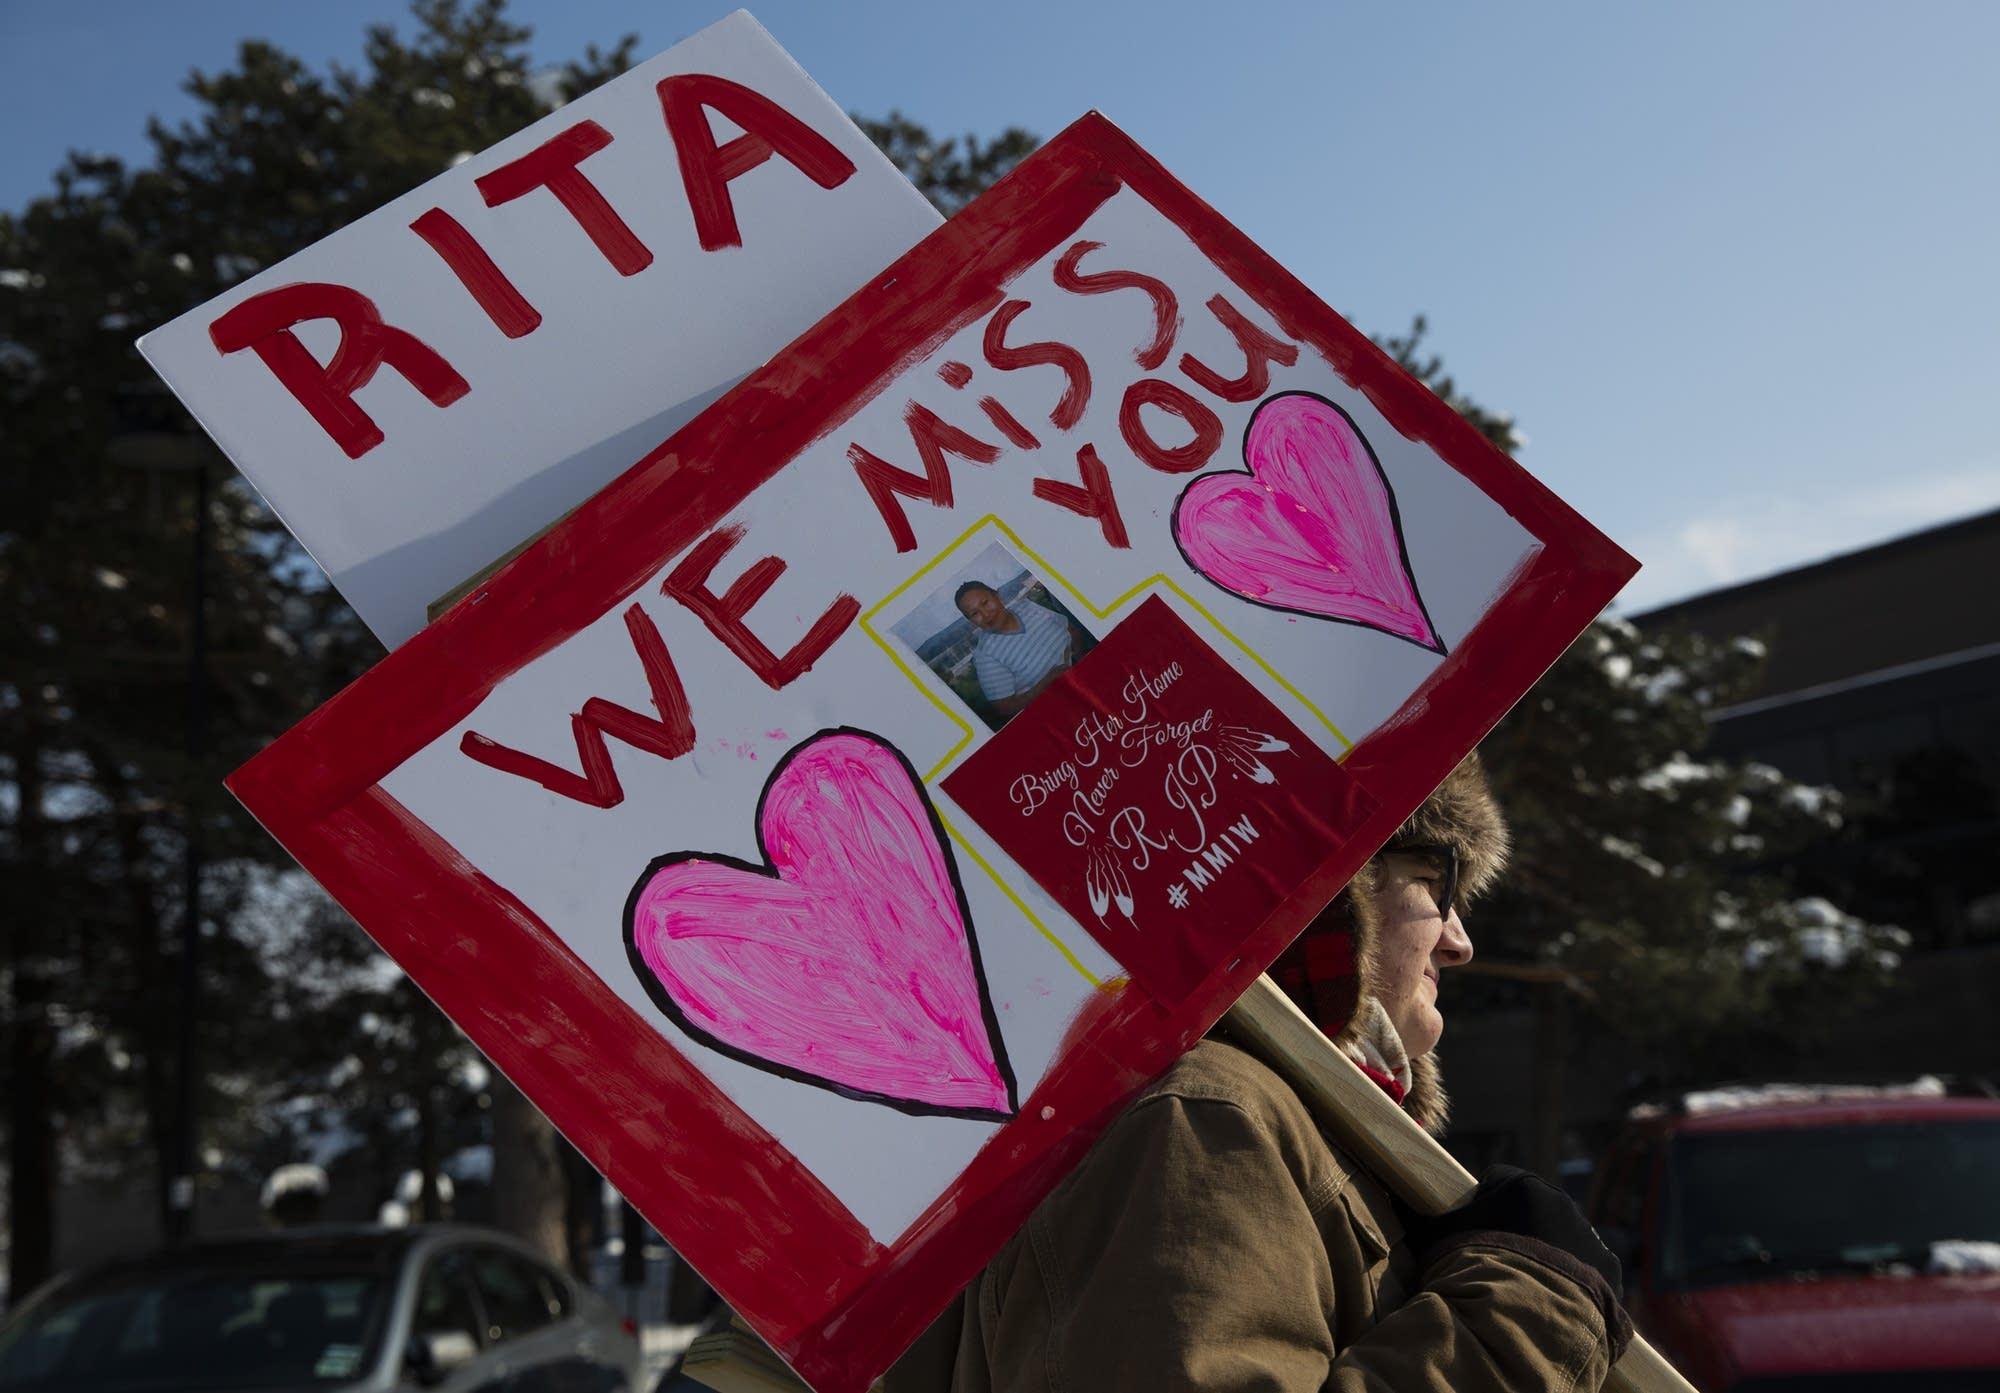 Thomas Peters of Tama, Iowa carries a sign honoring Rita Papakee.